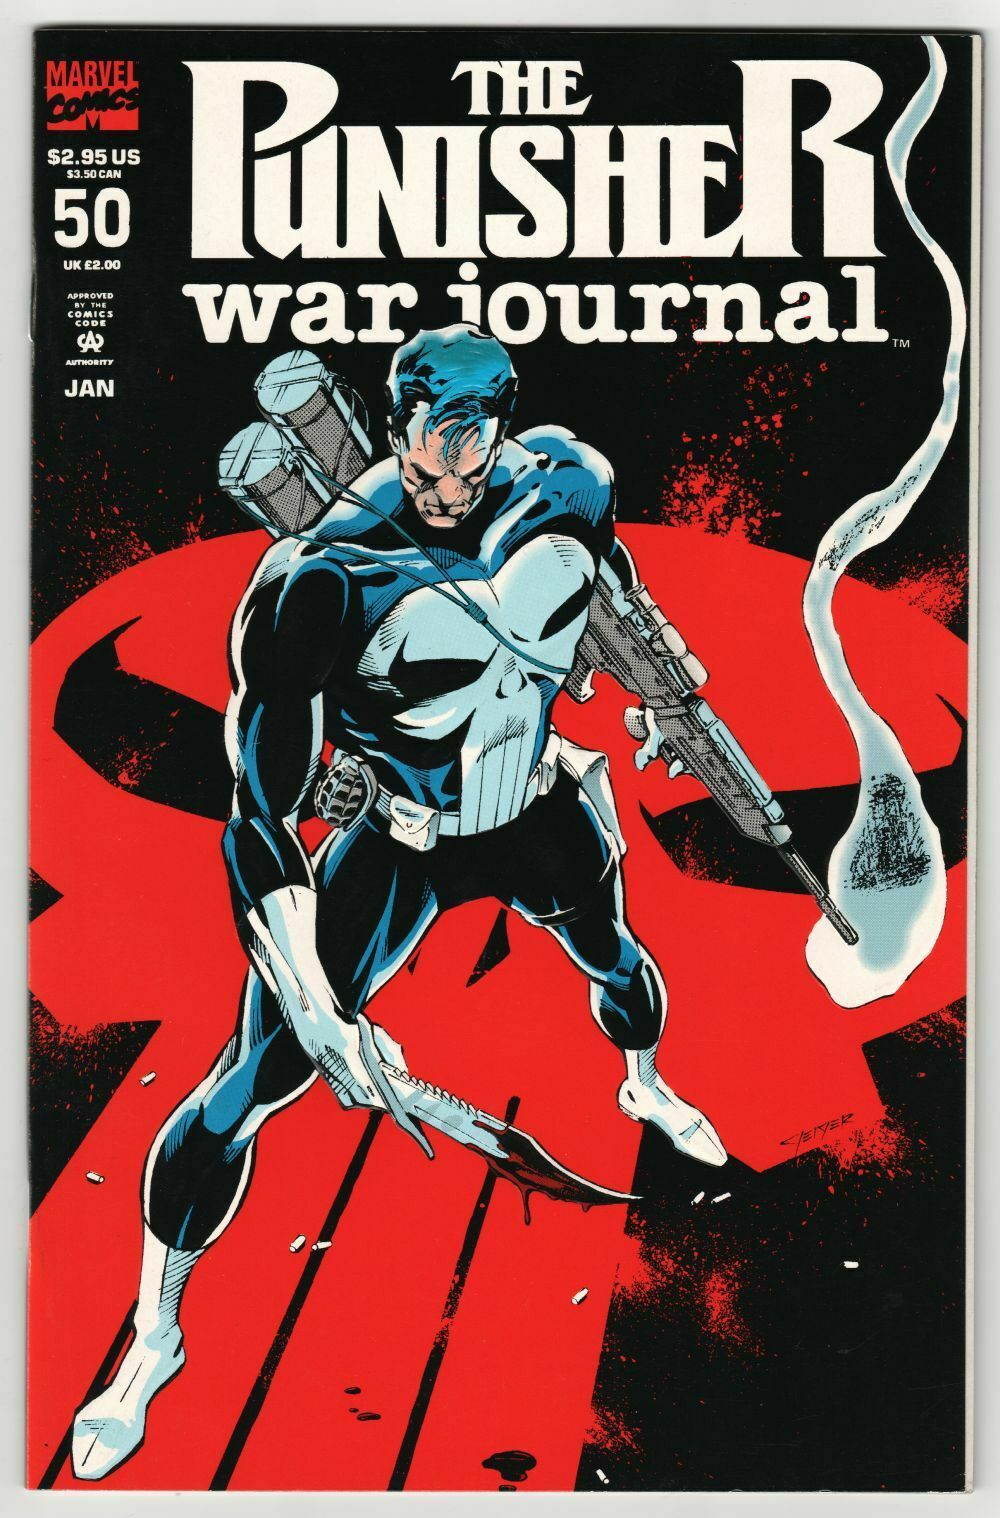 Punisher War Journal #32 FN 1991 Stock Image